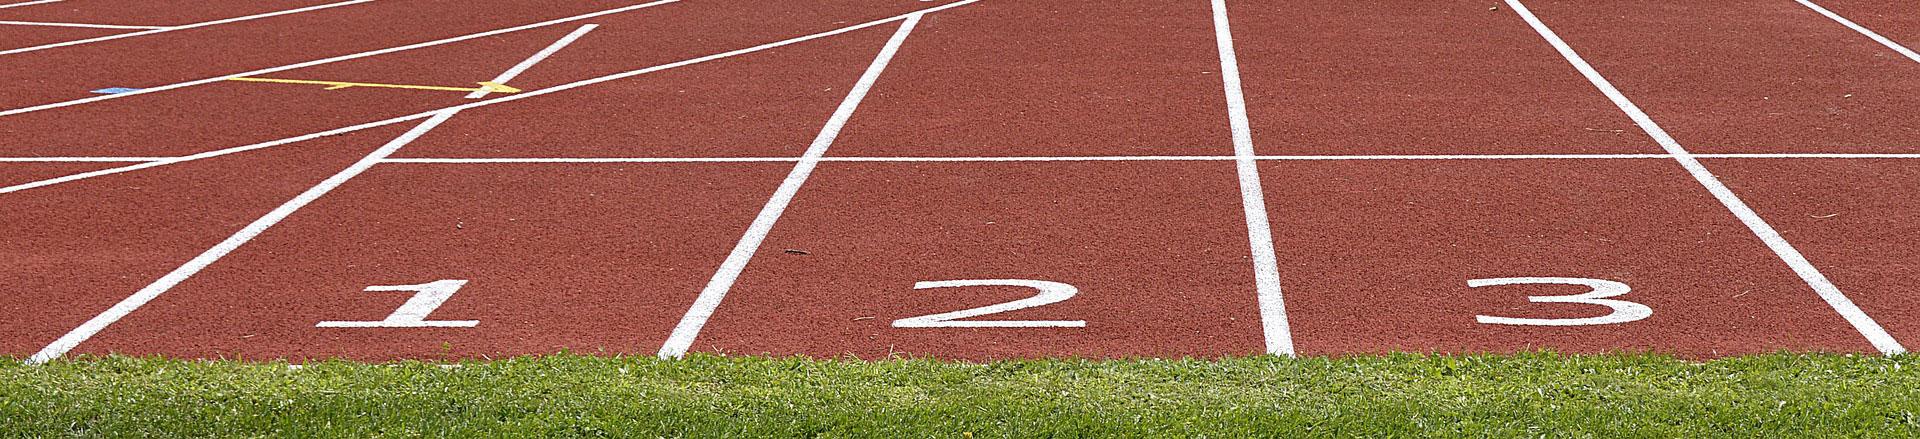 pixabay-tartan-track-2678543_1920